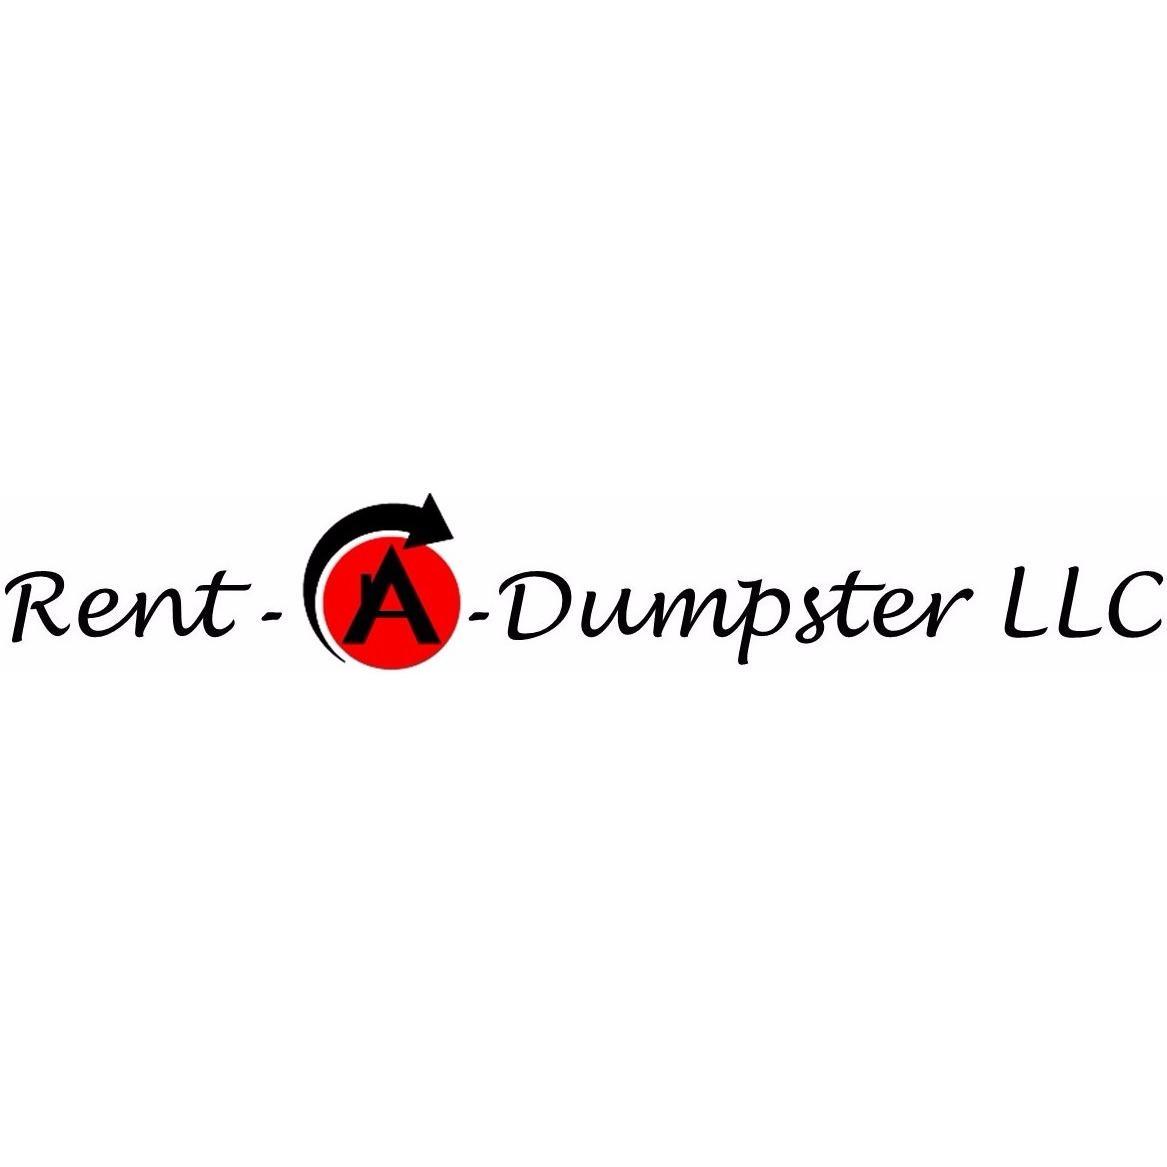 Rent-A-Dumpster LLC. image 3